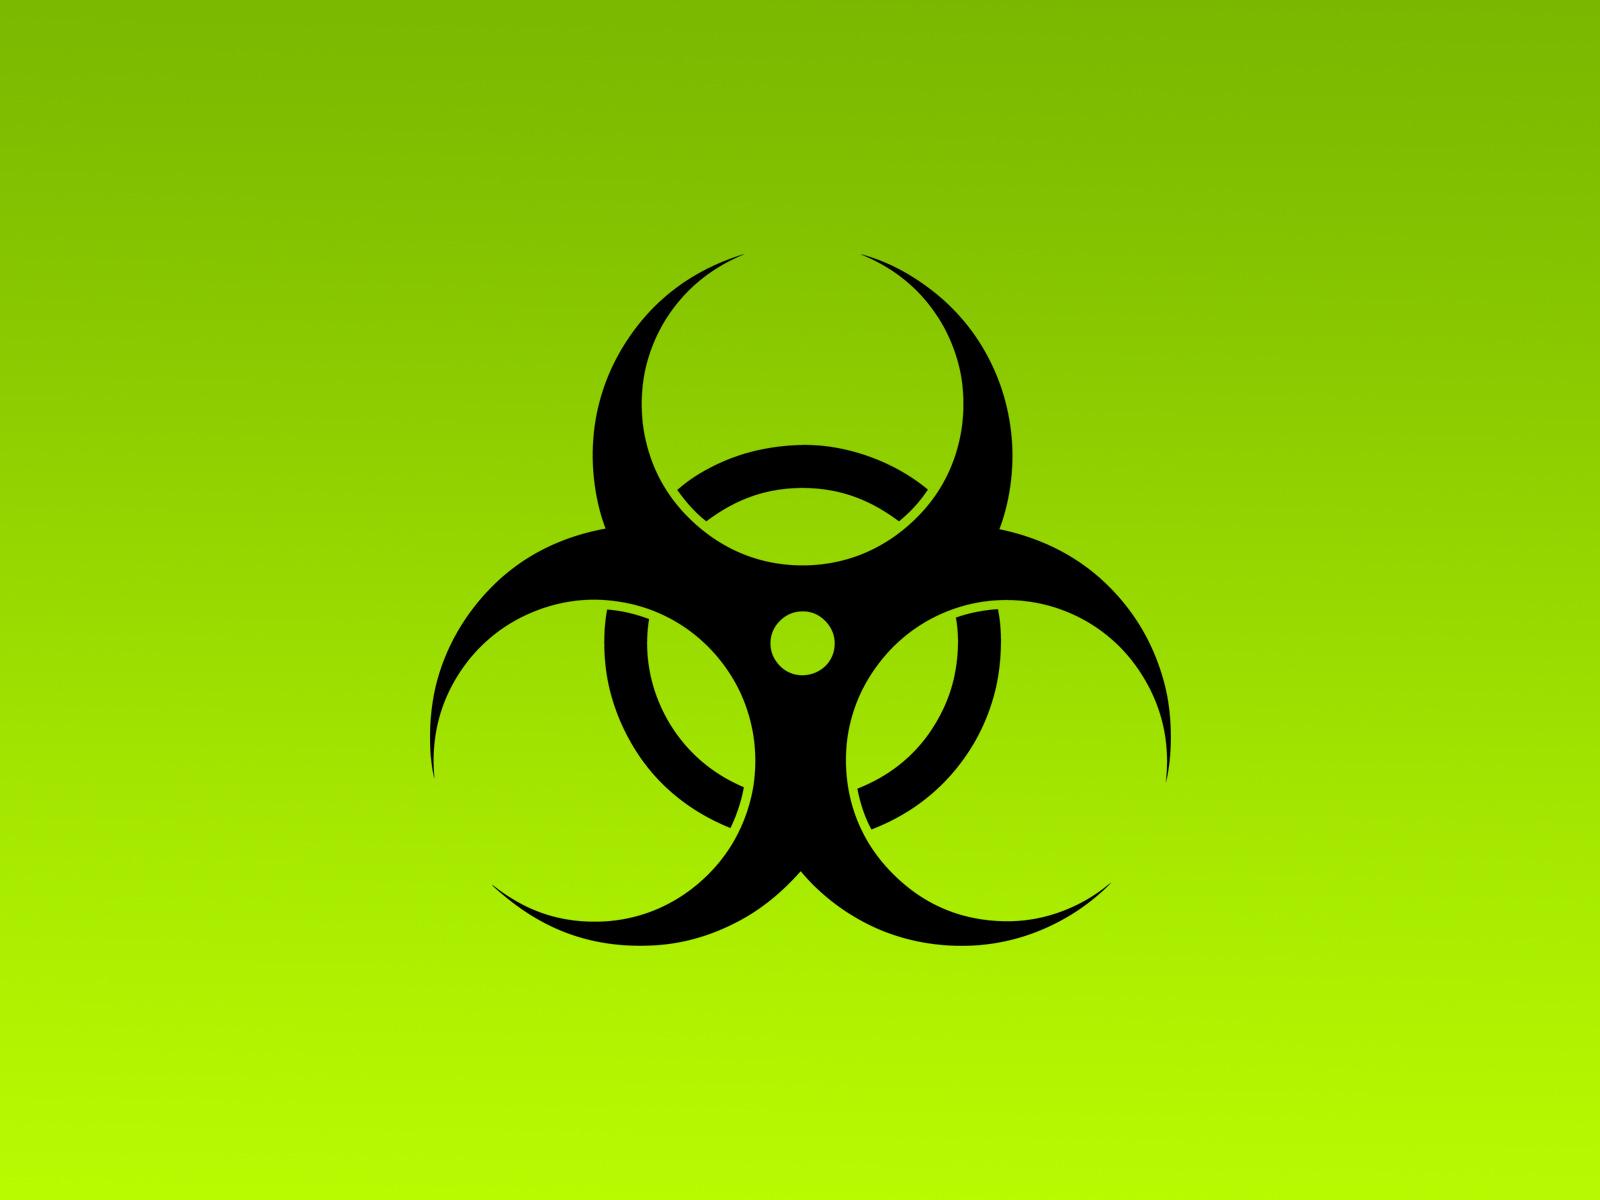 BioHazard   Radioactive Symbol HD Wallpapers 1600x1200